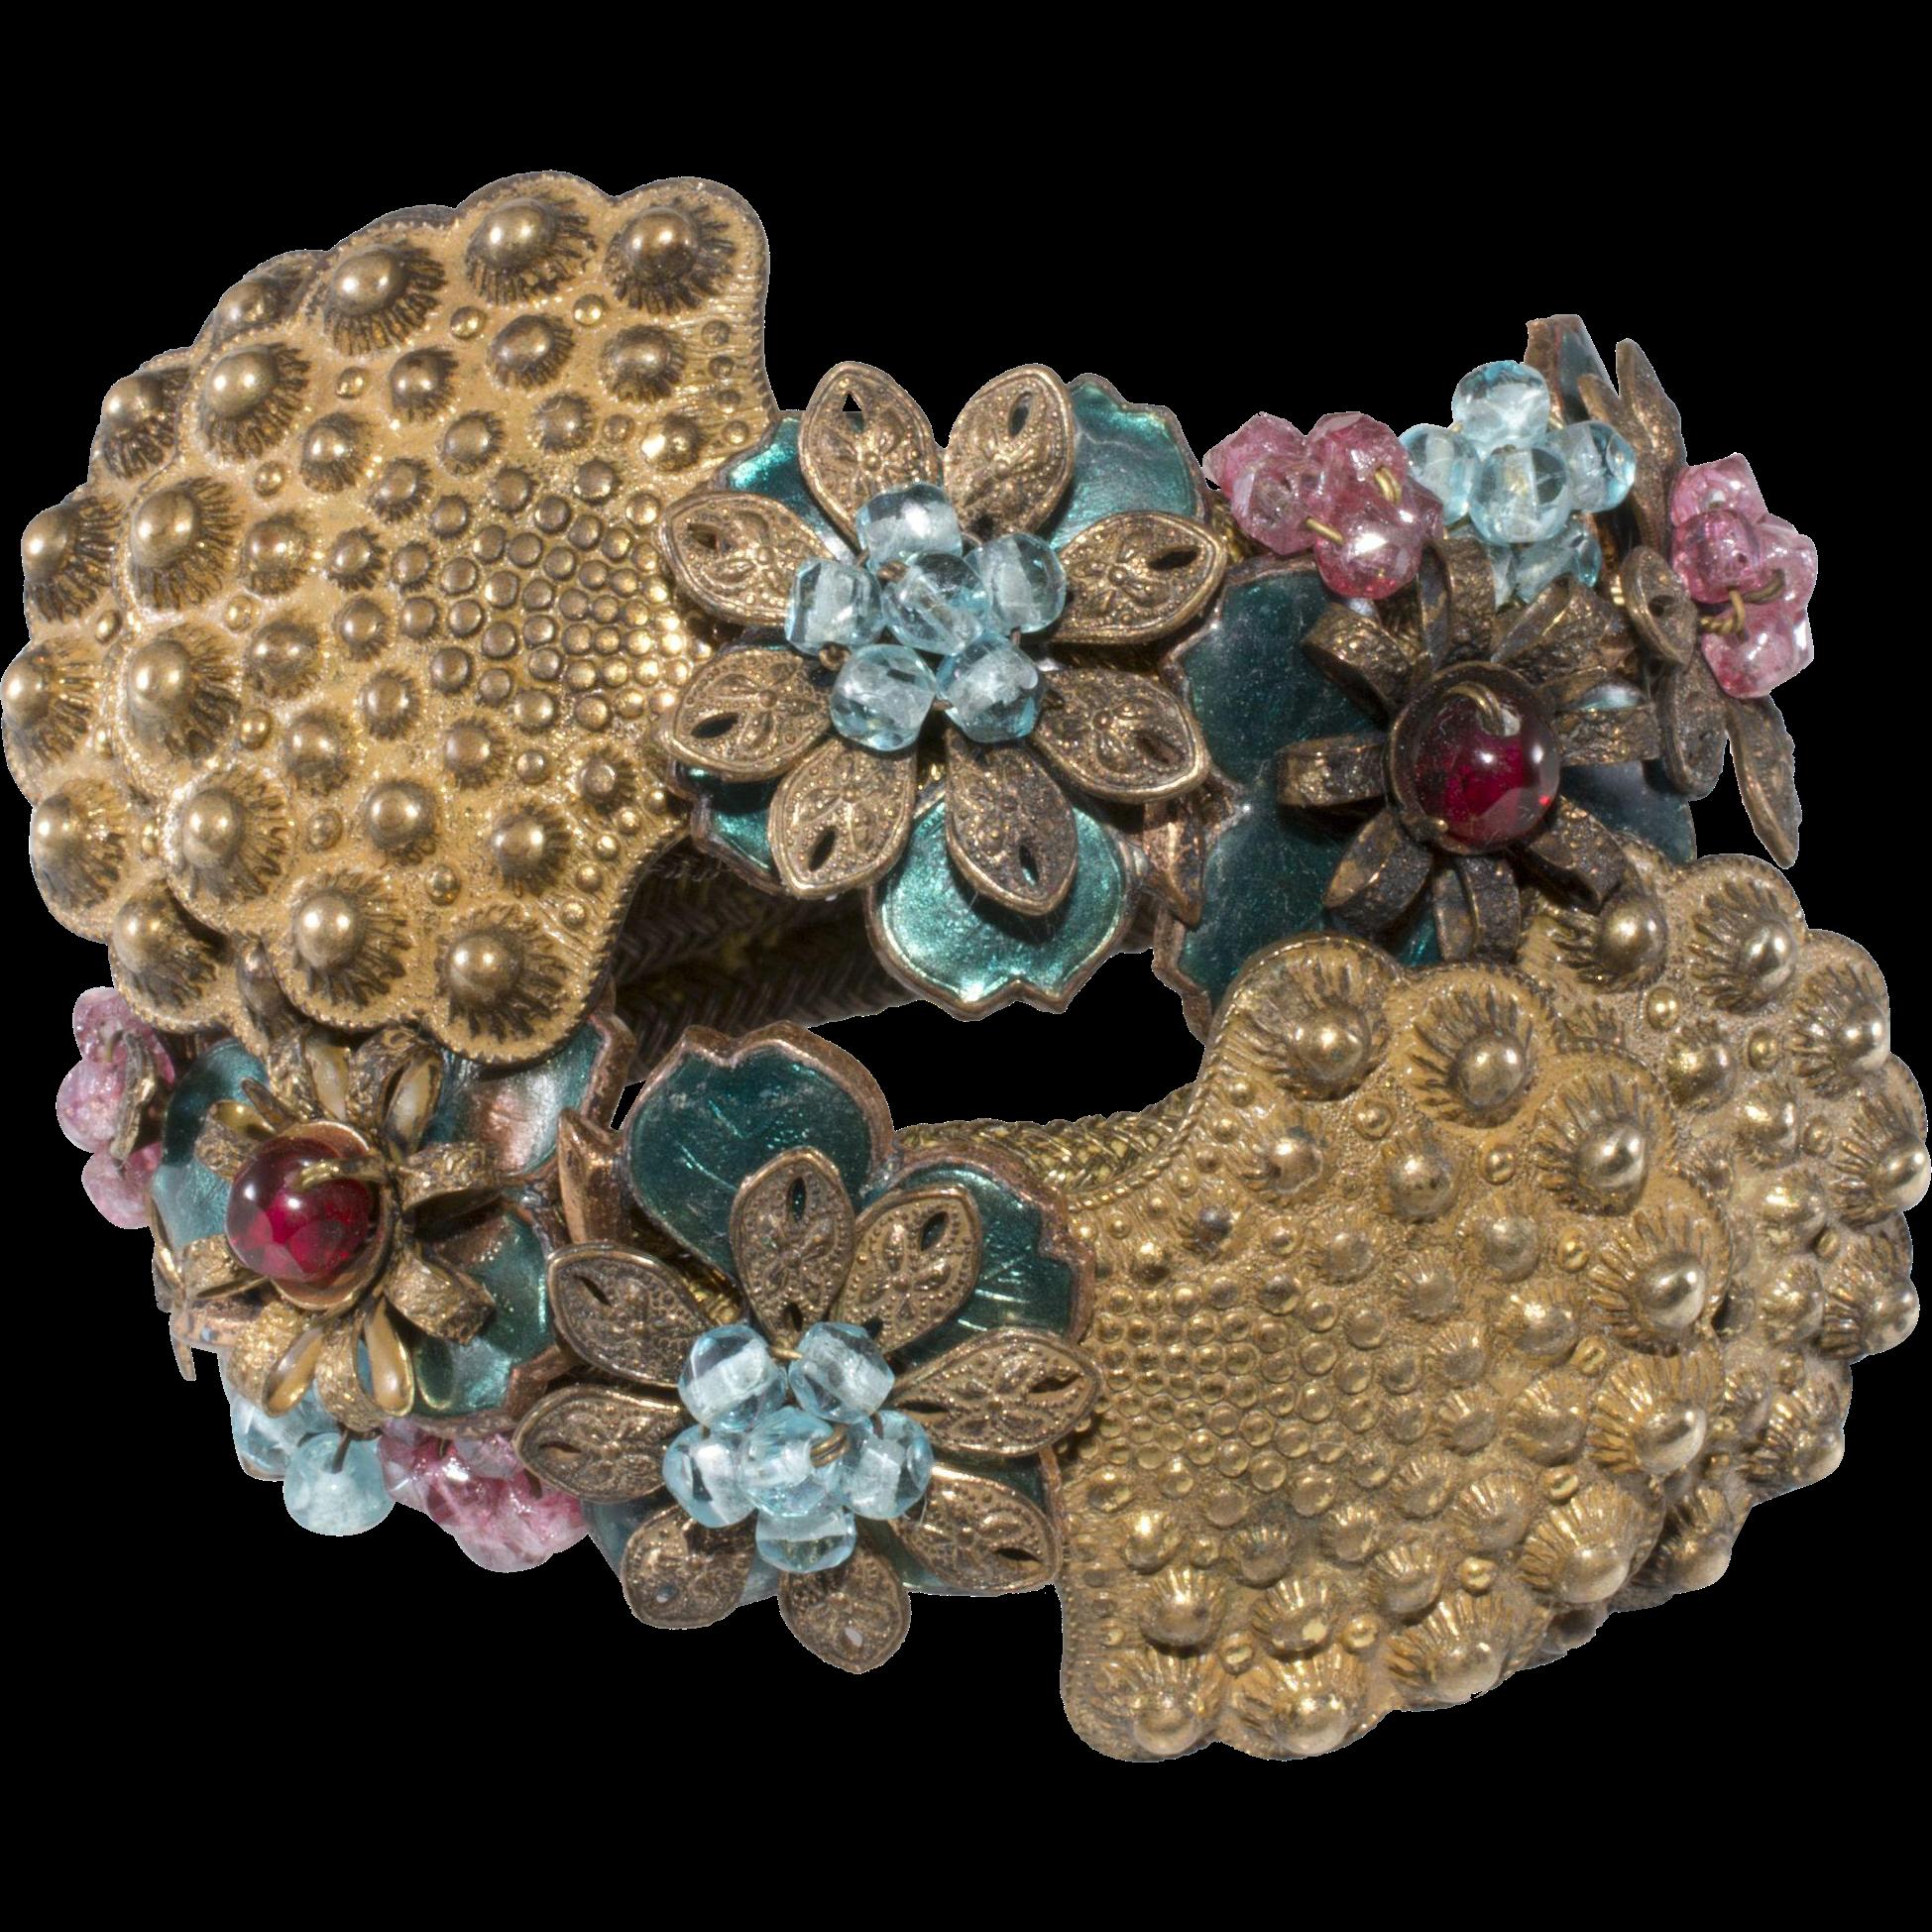 Miriam Haskell 1940s Enamel and Bead Wrap Bracelet by Frank Hess